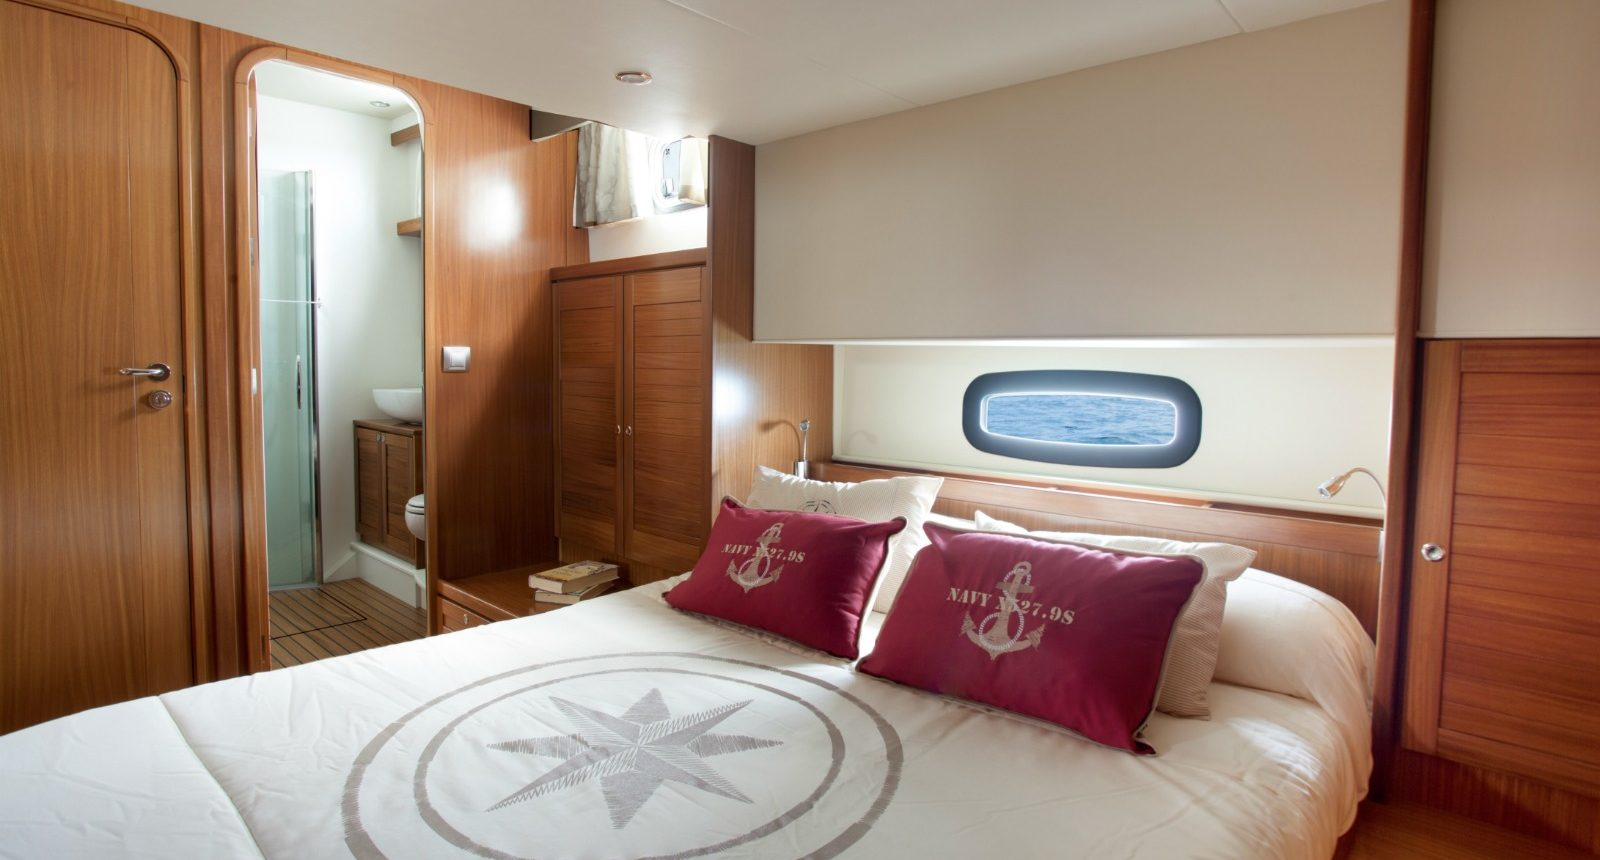 Minorca Islander 54 yacht for sale - master stateroom